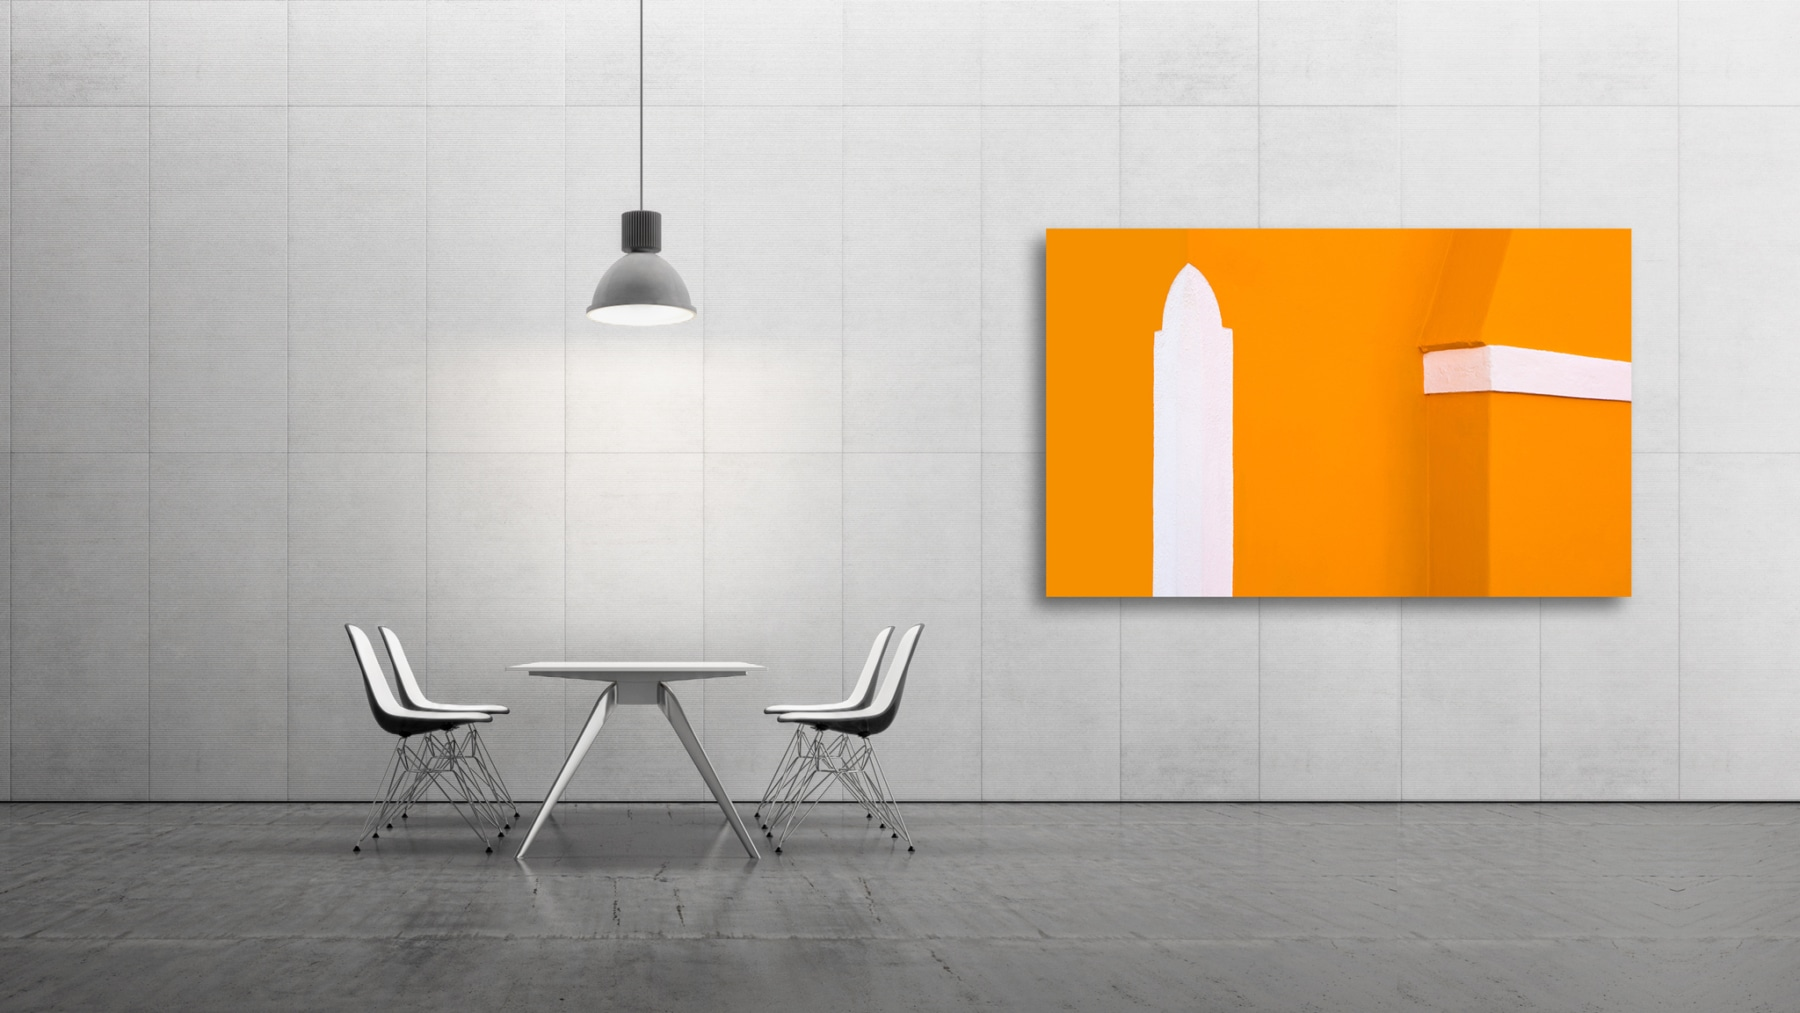 Orange - Fine Art, Color, Farbe, Italy, Venedig, Burano, Gerry Pacher